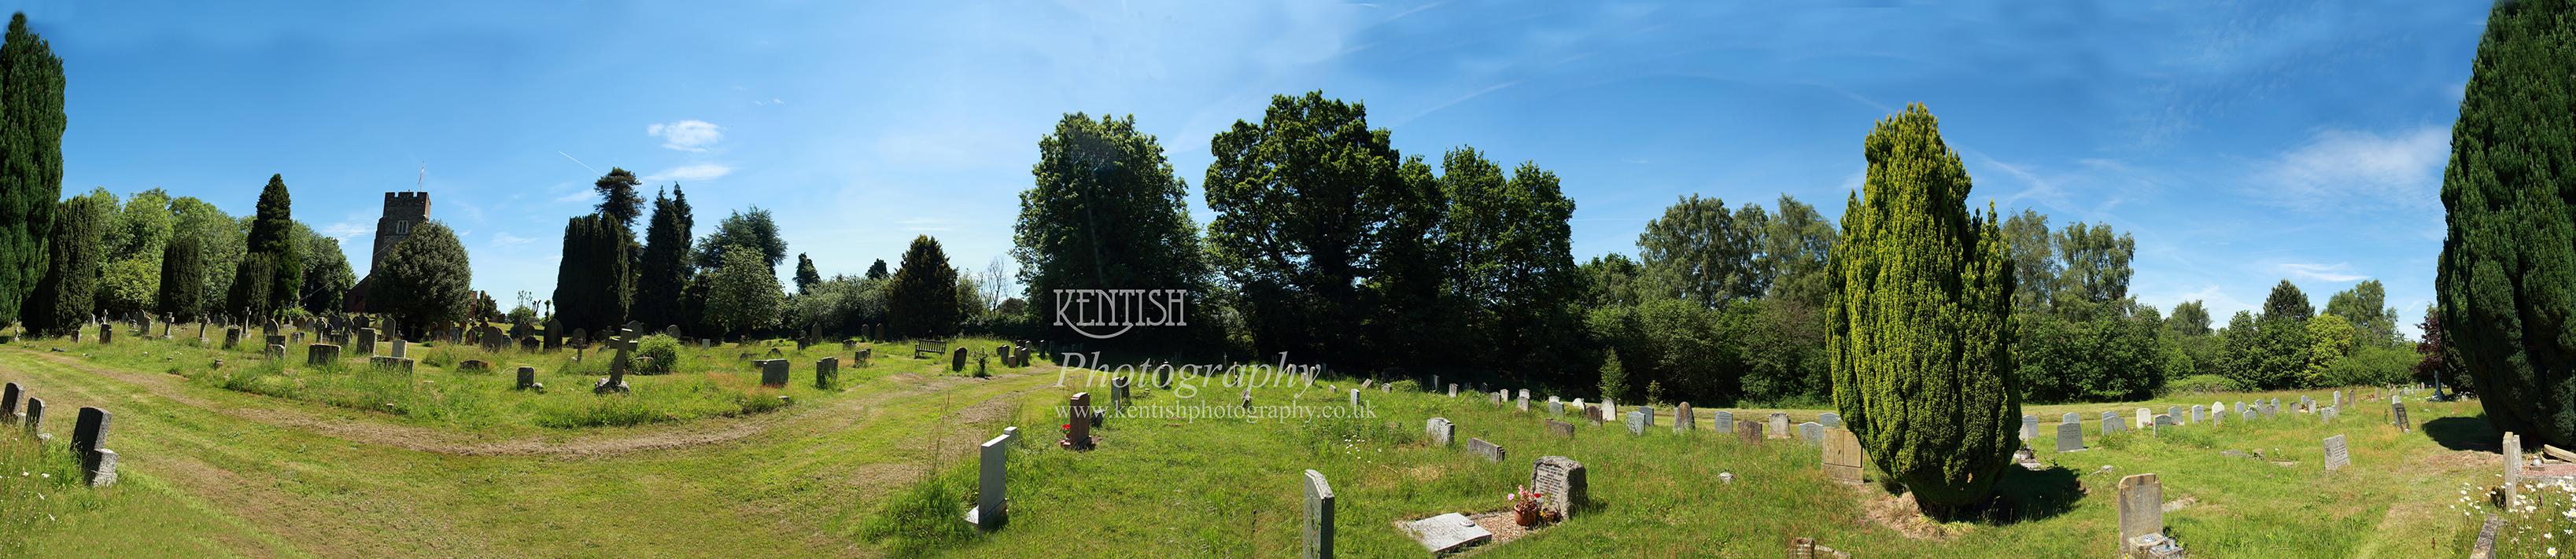 Ightham Churchyard